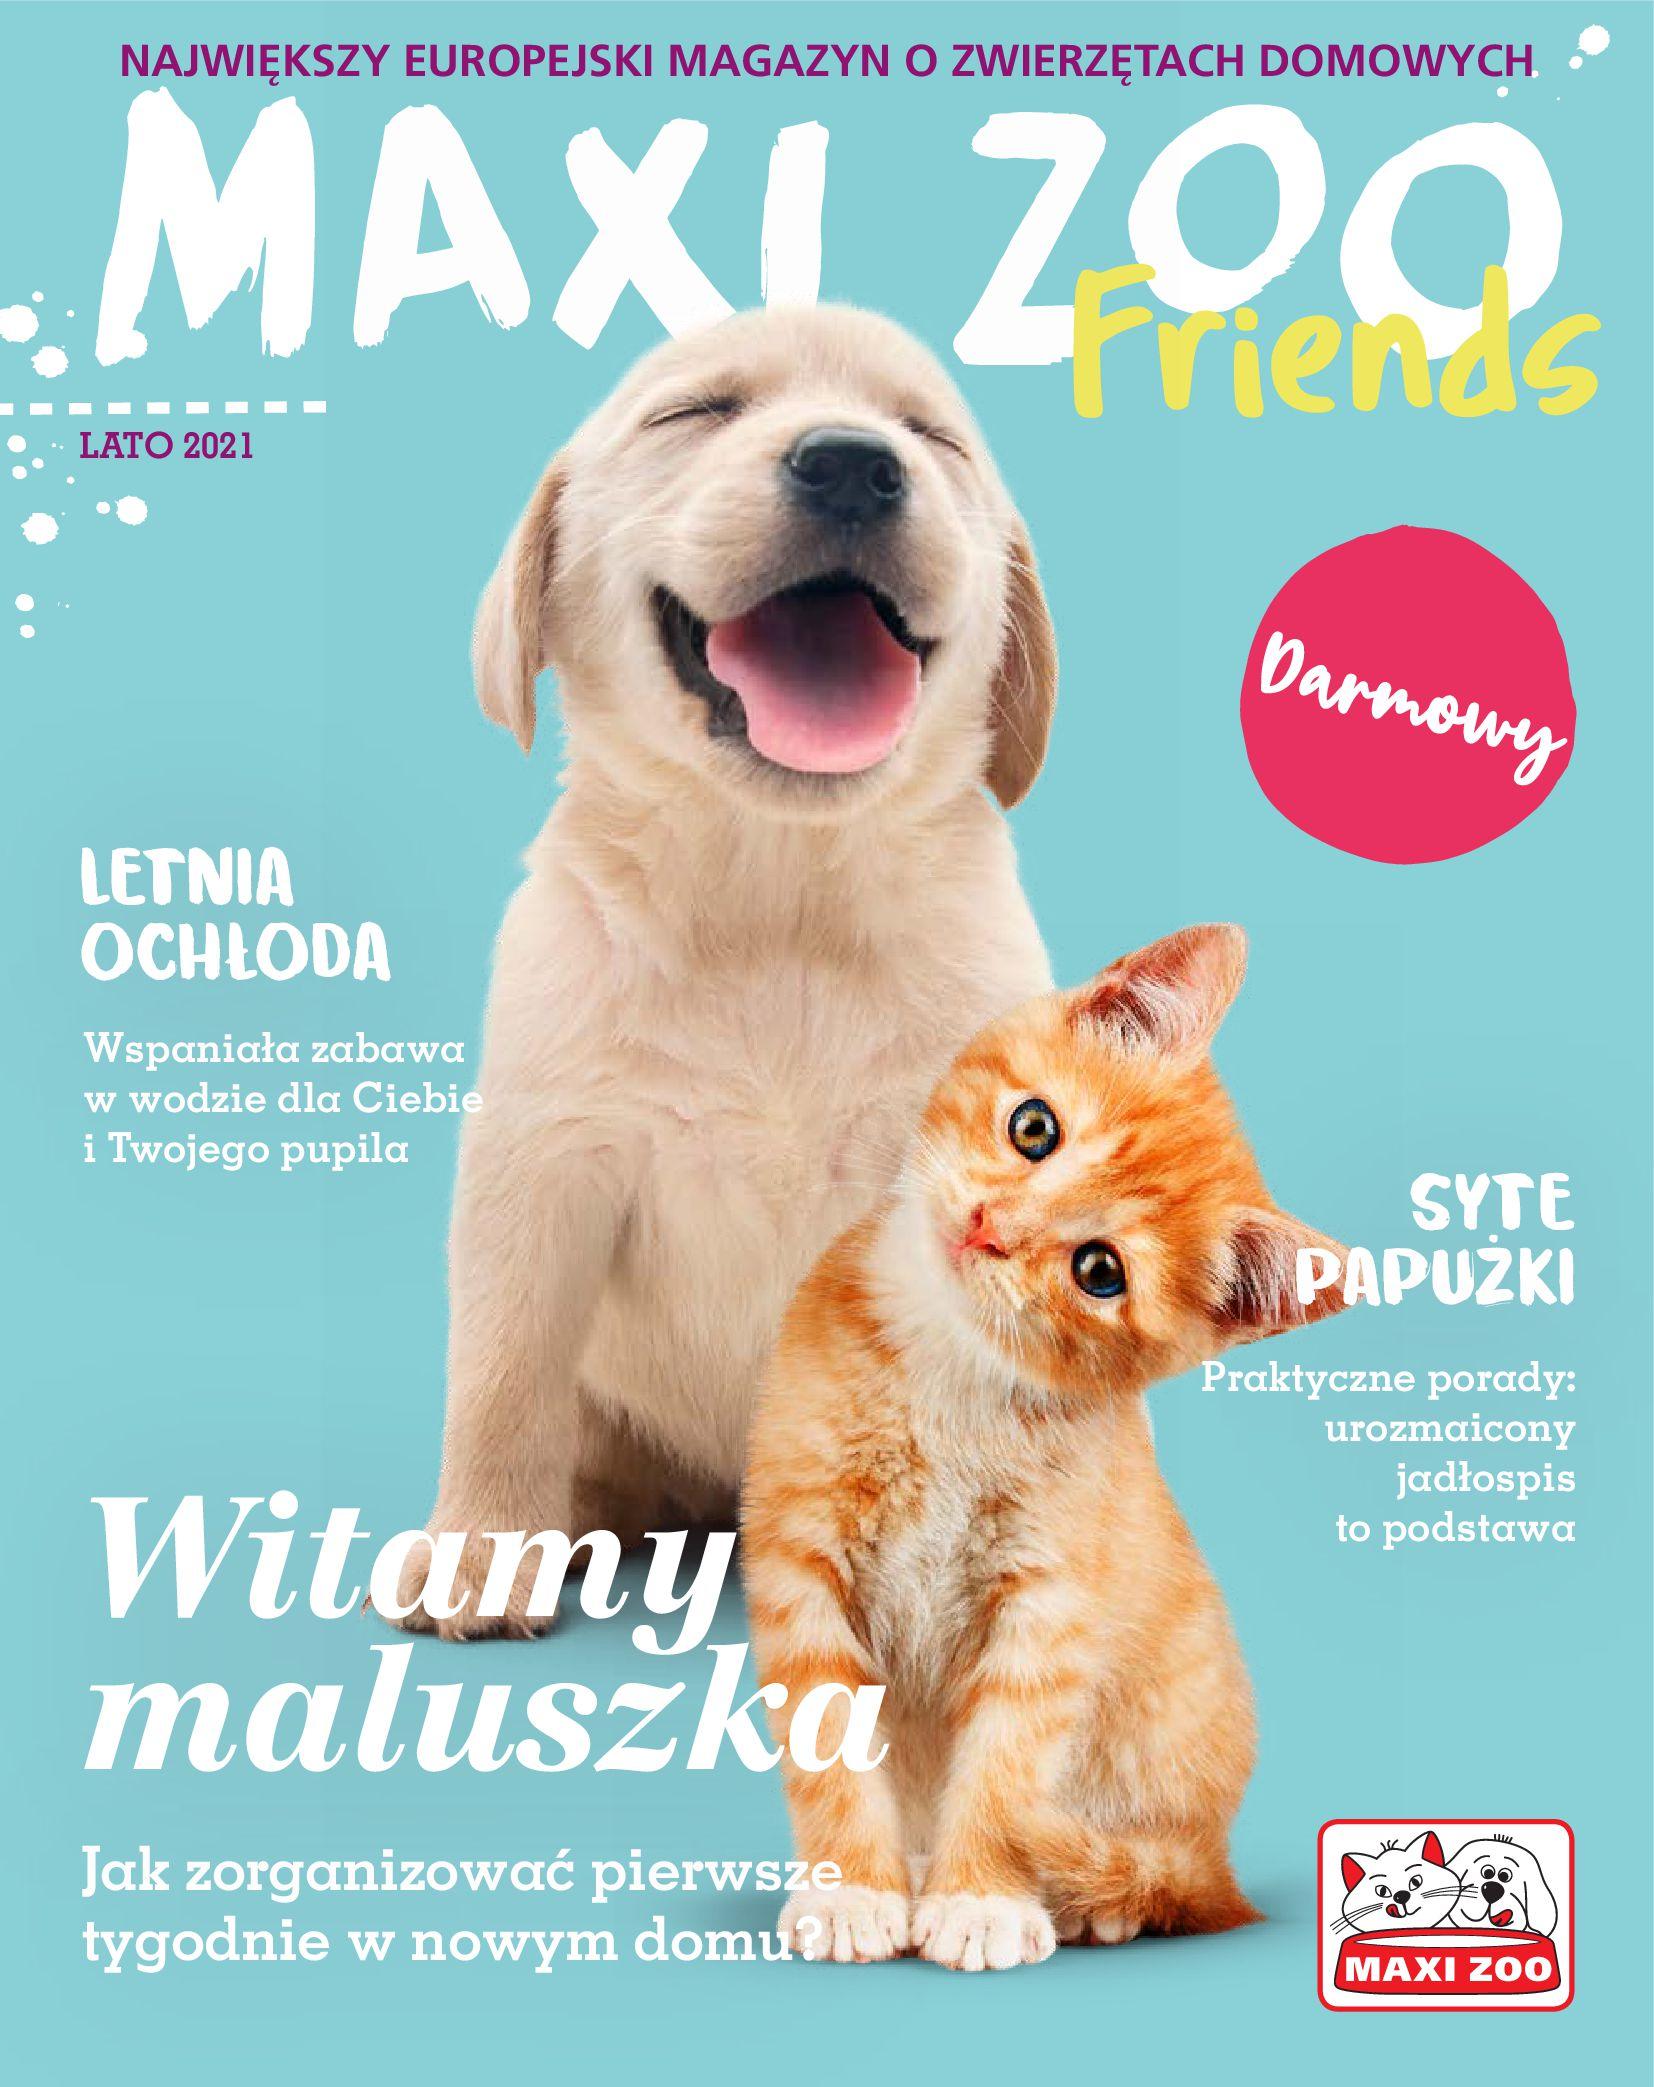 Maxi Zoo:  Gazetka Maxi Zoo - Friends 17.05.2021